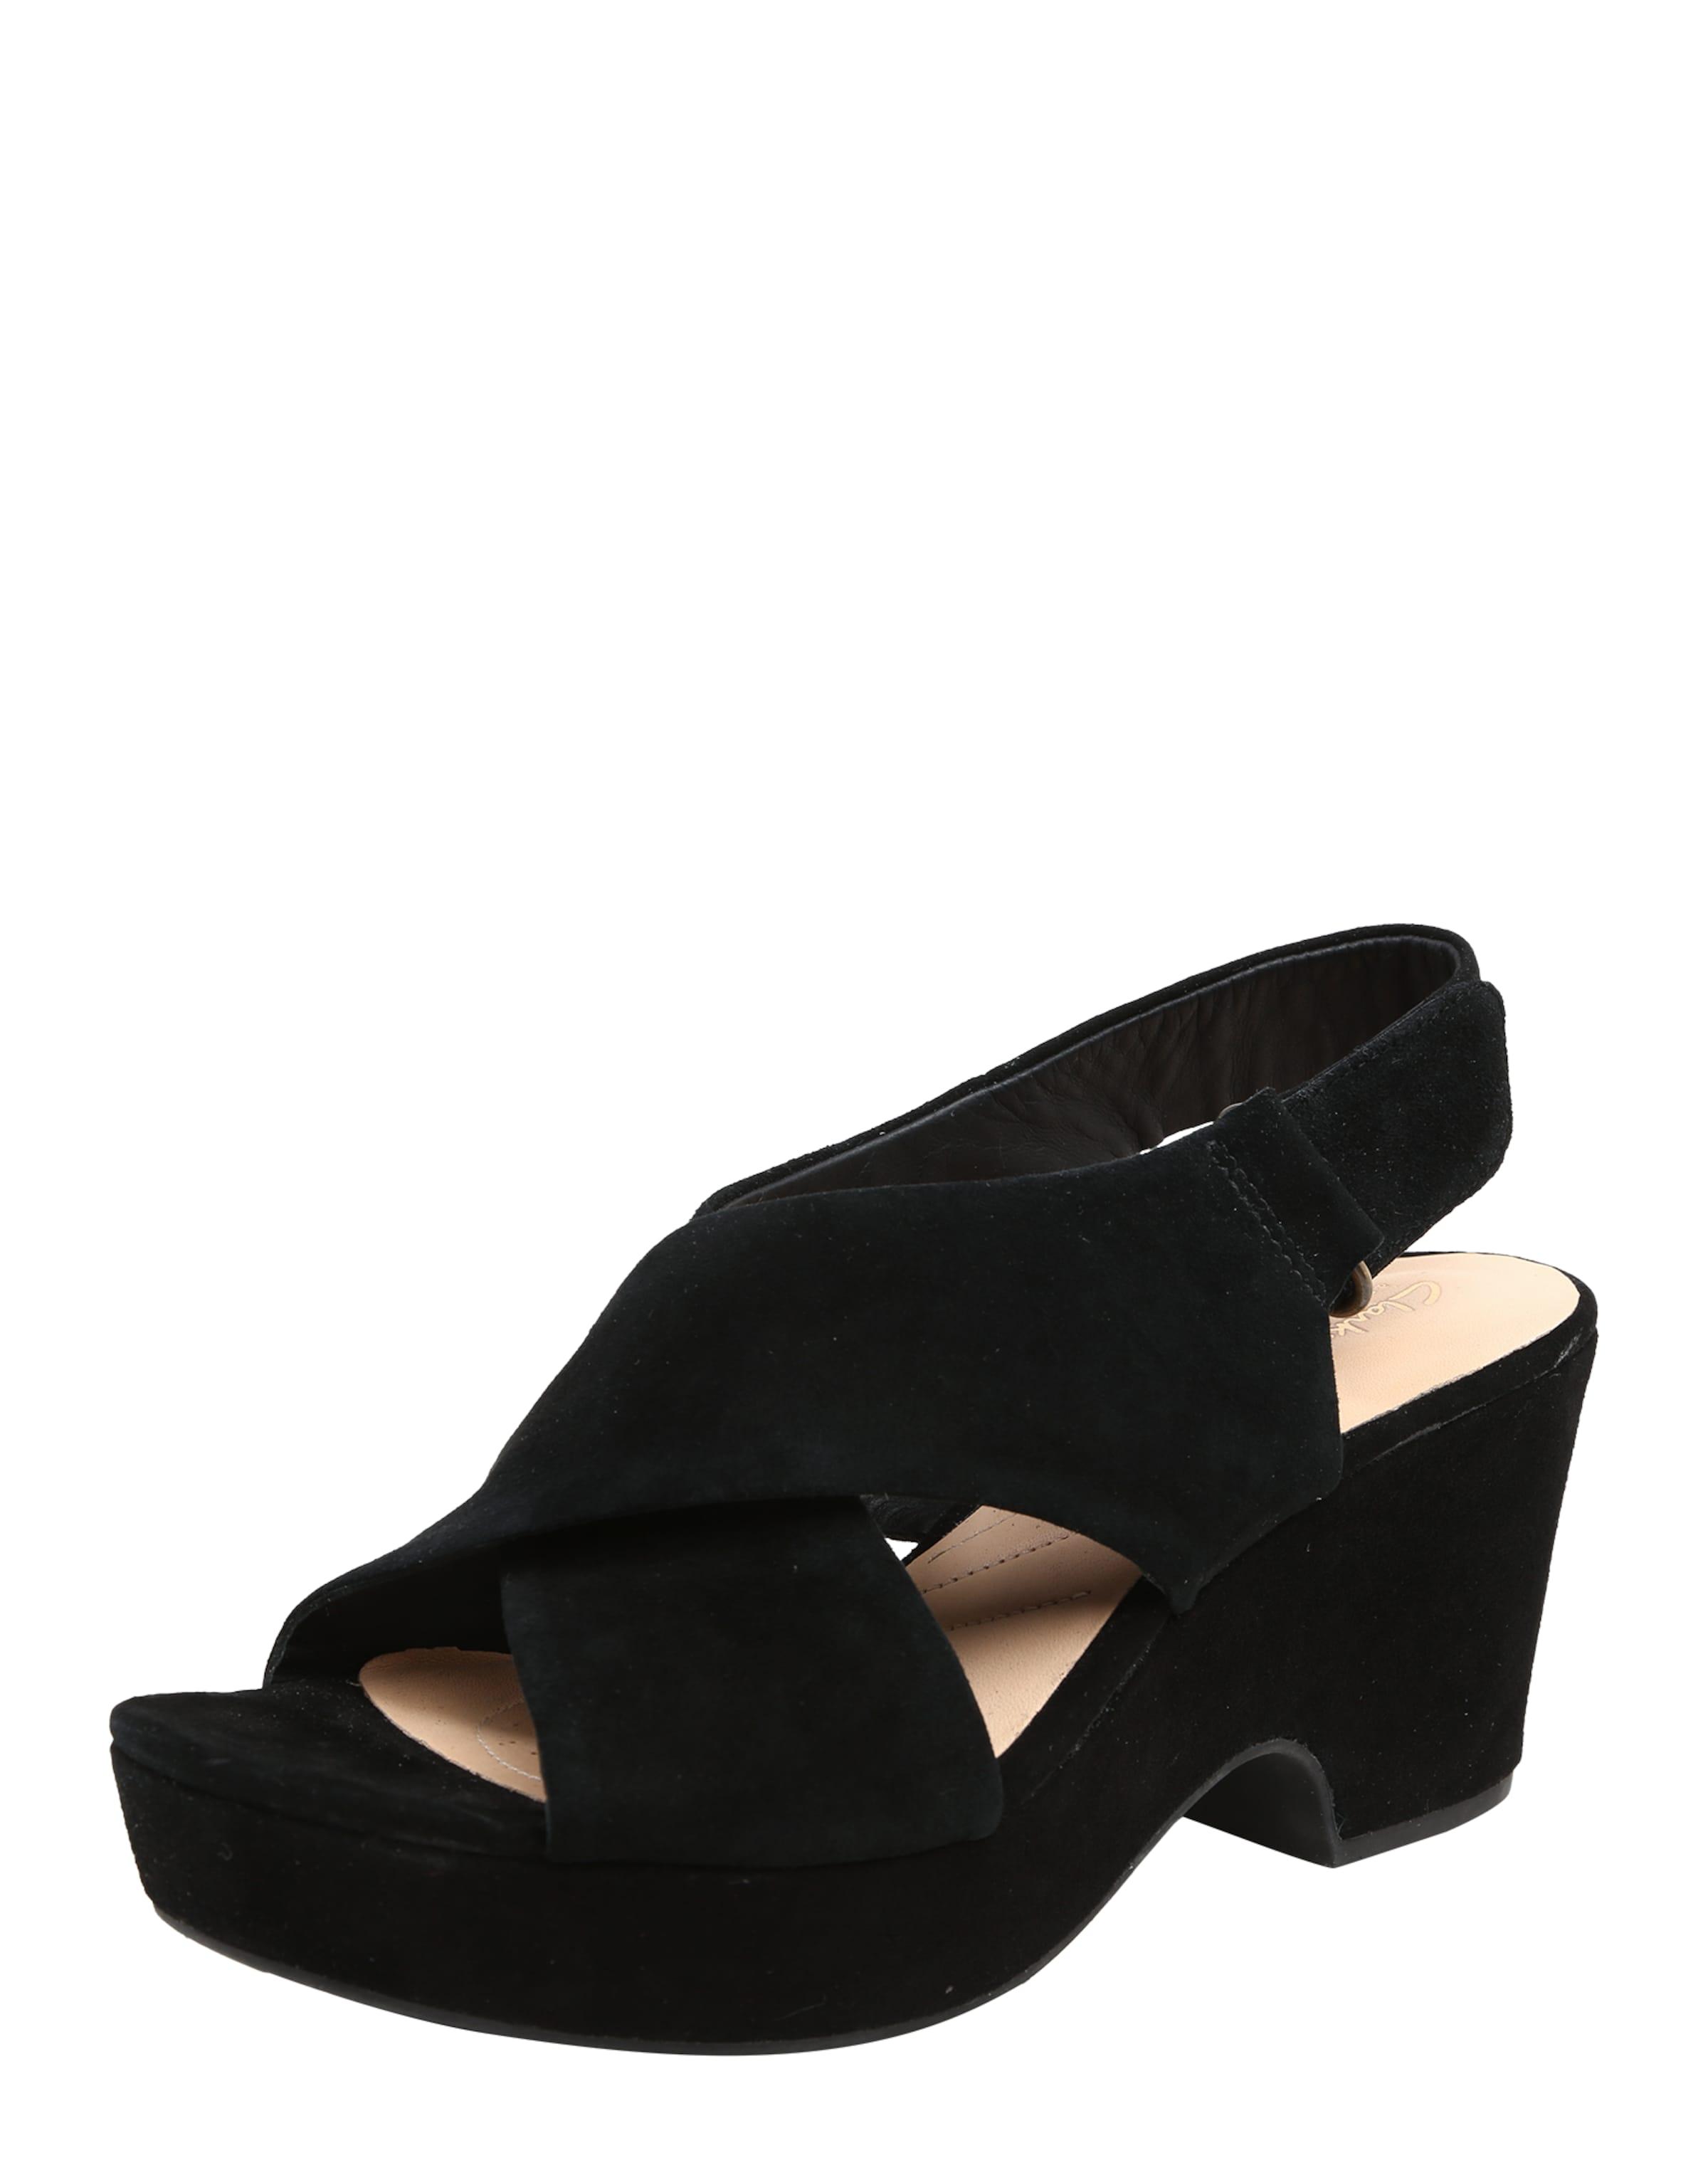 CLARKS Sandalen Maritsa lara Verschleißfeste billige Schuhe